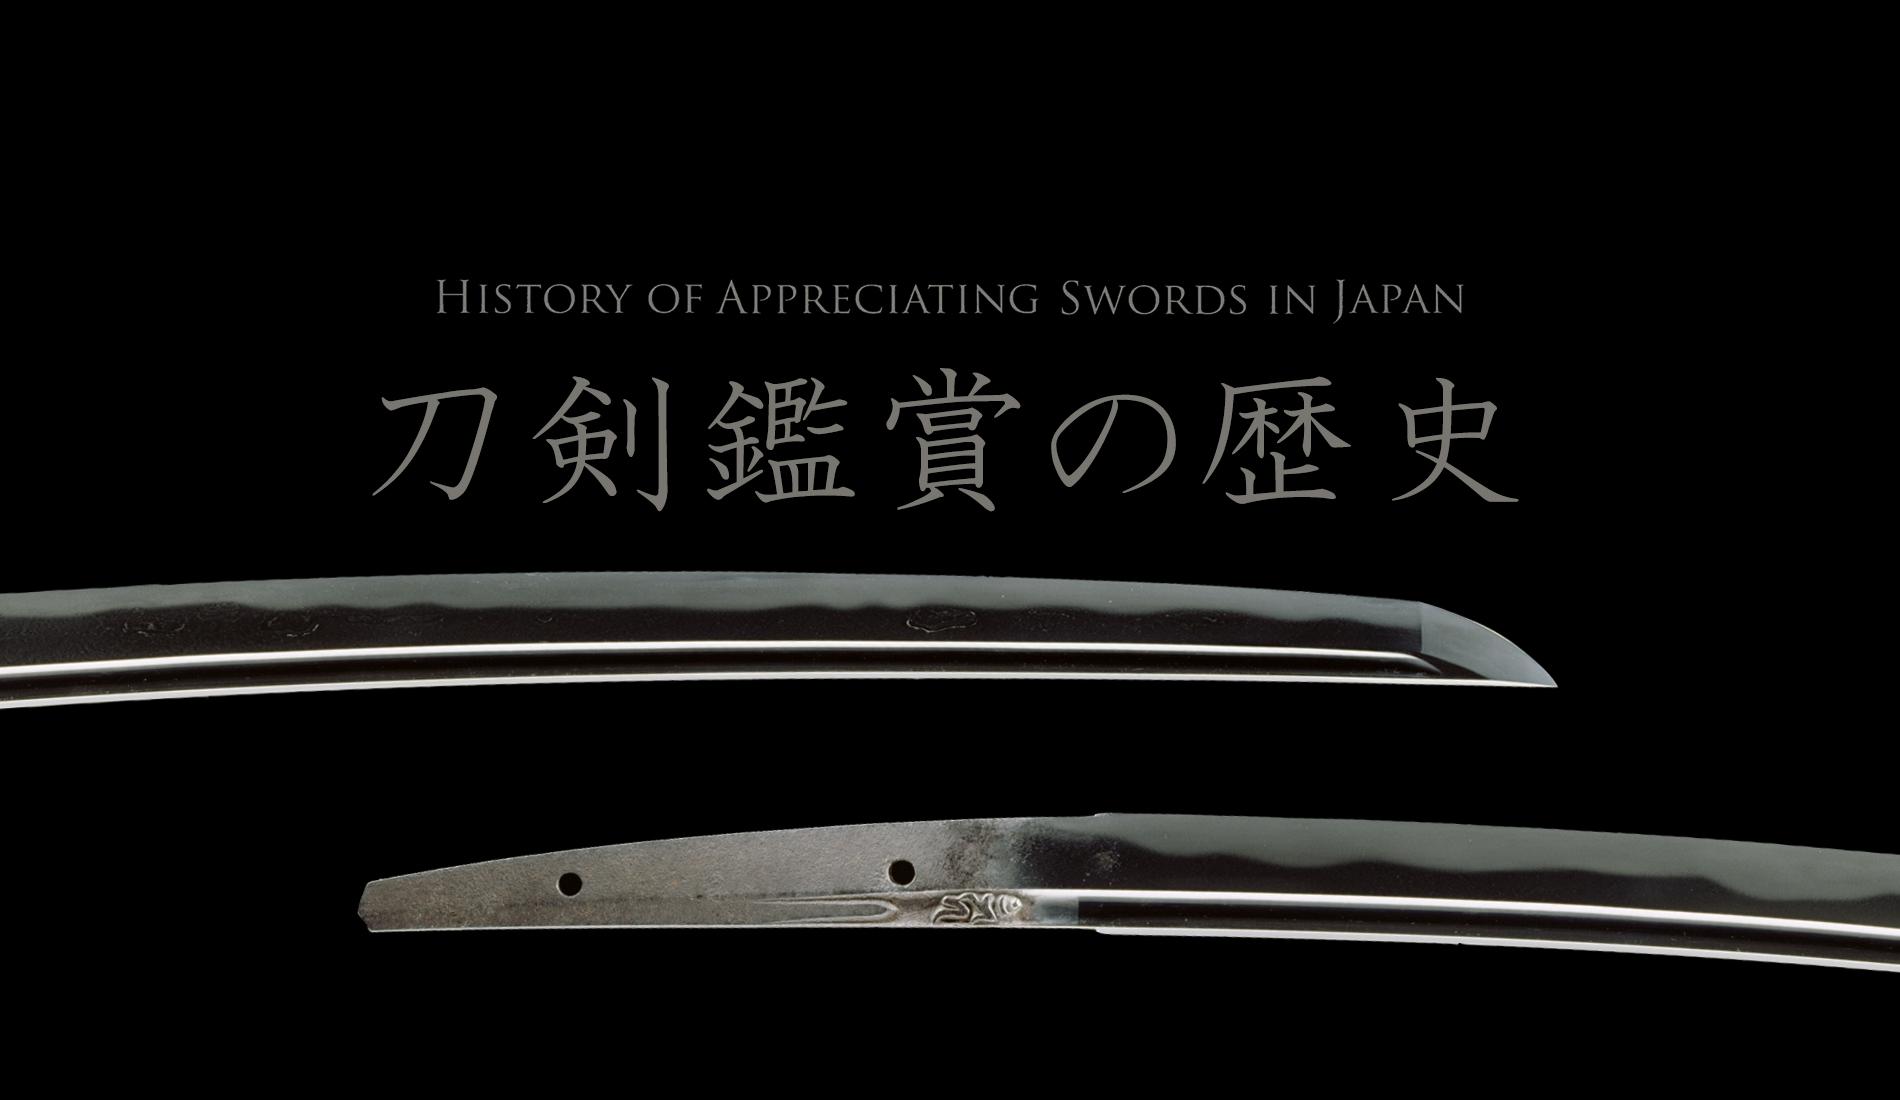 刀剣鑑賞の歴史